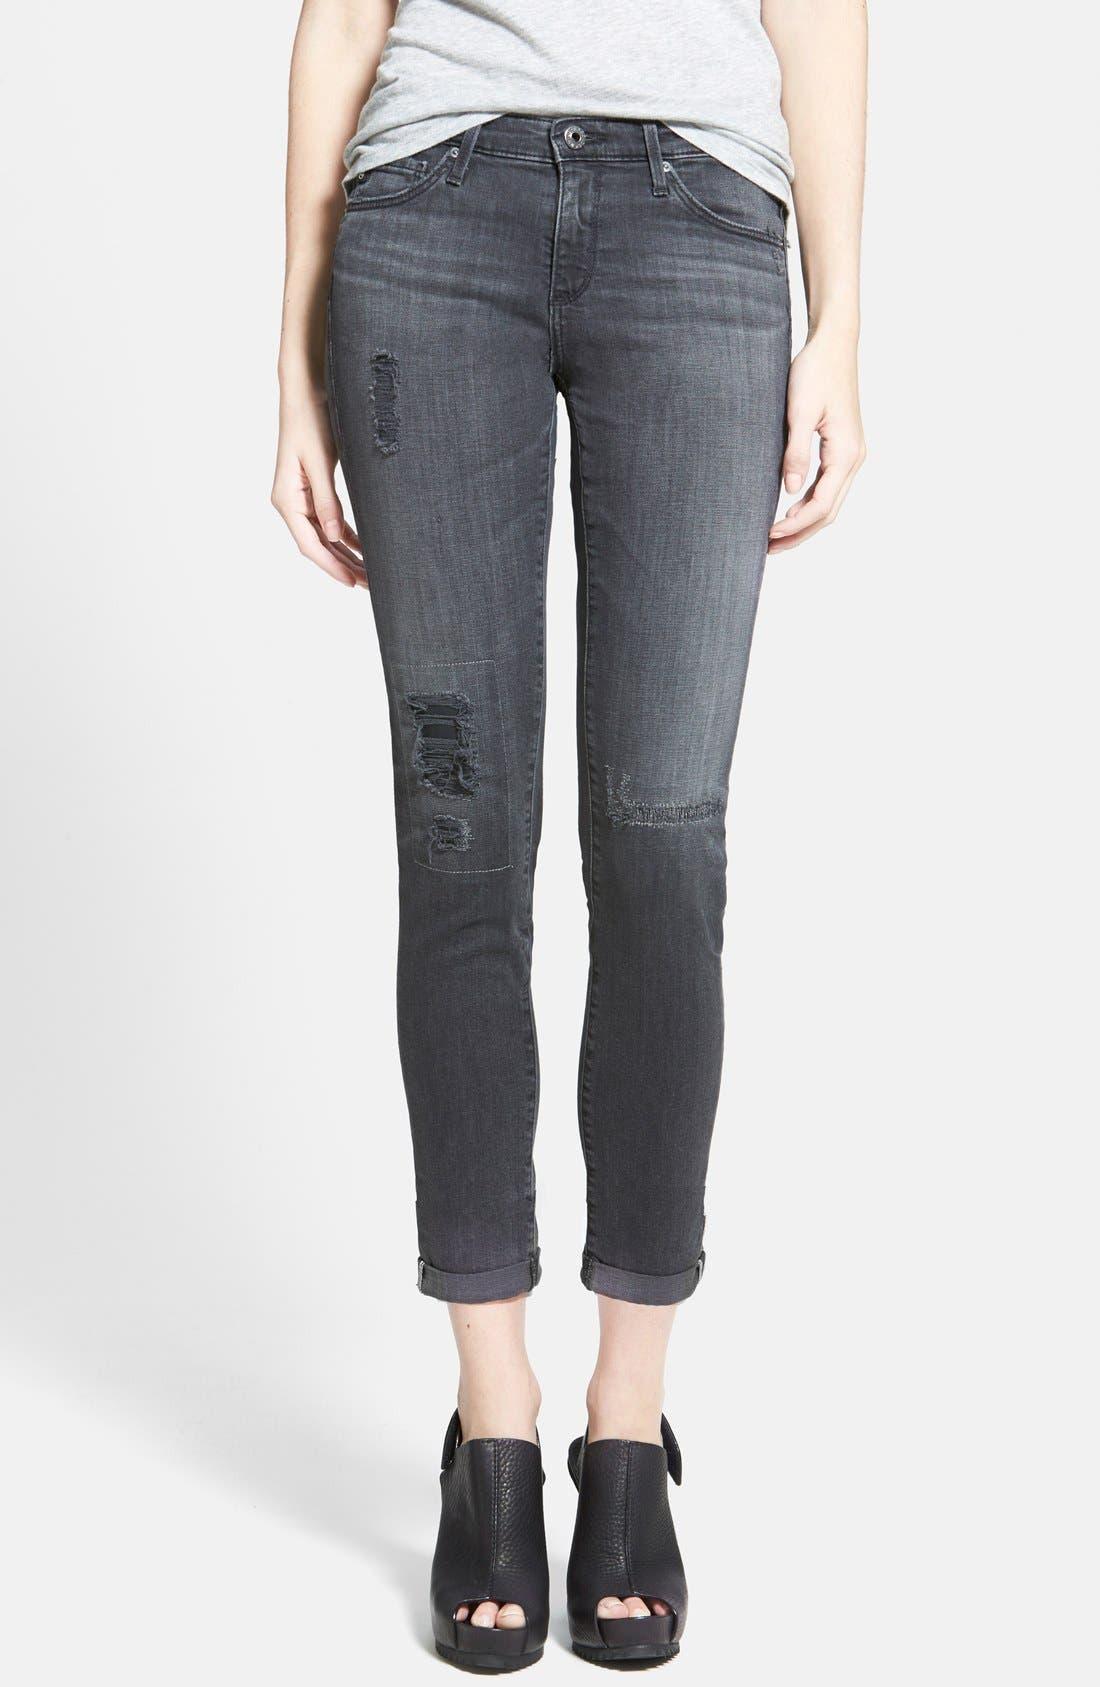 Alternate Image 1 Selected - AG 'The Stilt' Cuffed Cigarette Jeans (Mantra Mended)